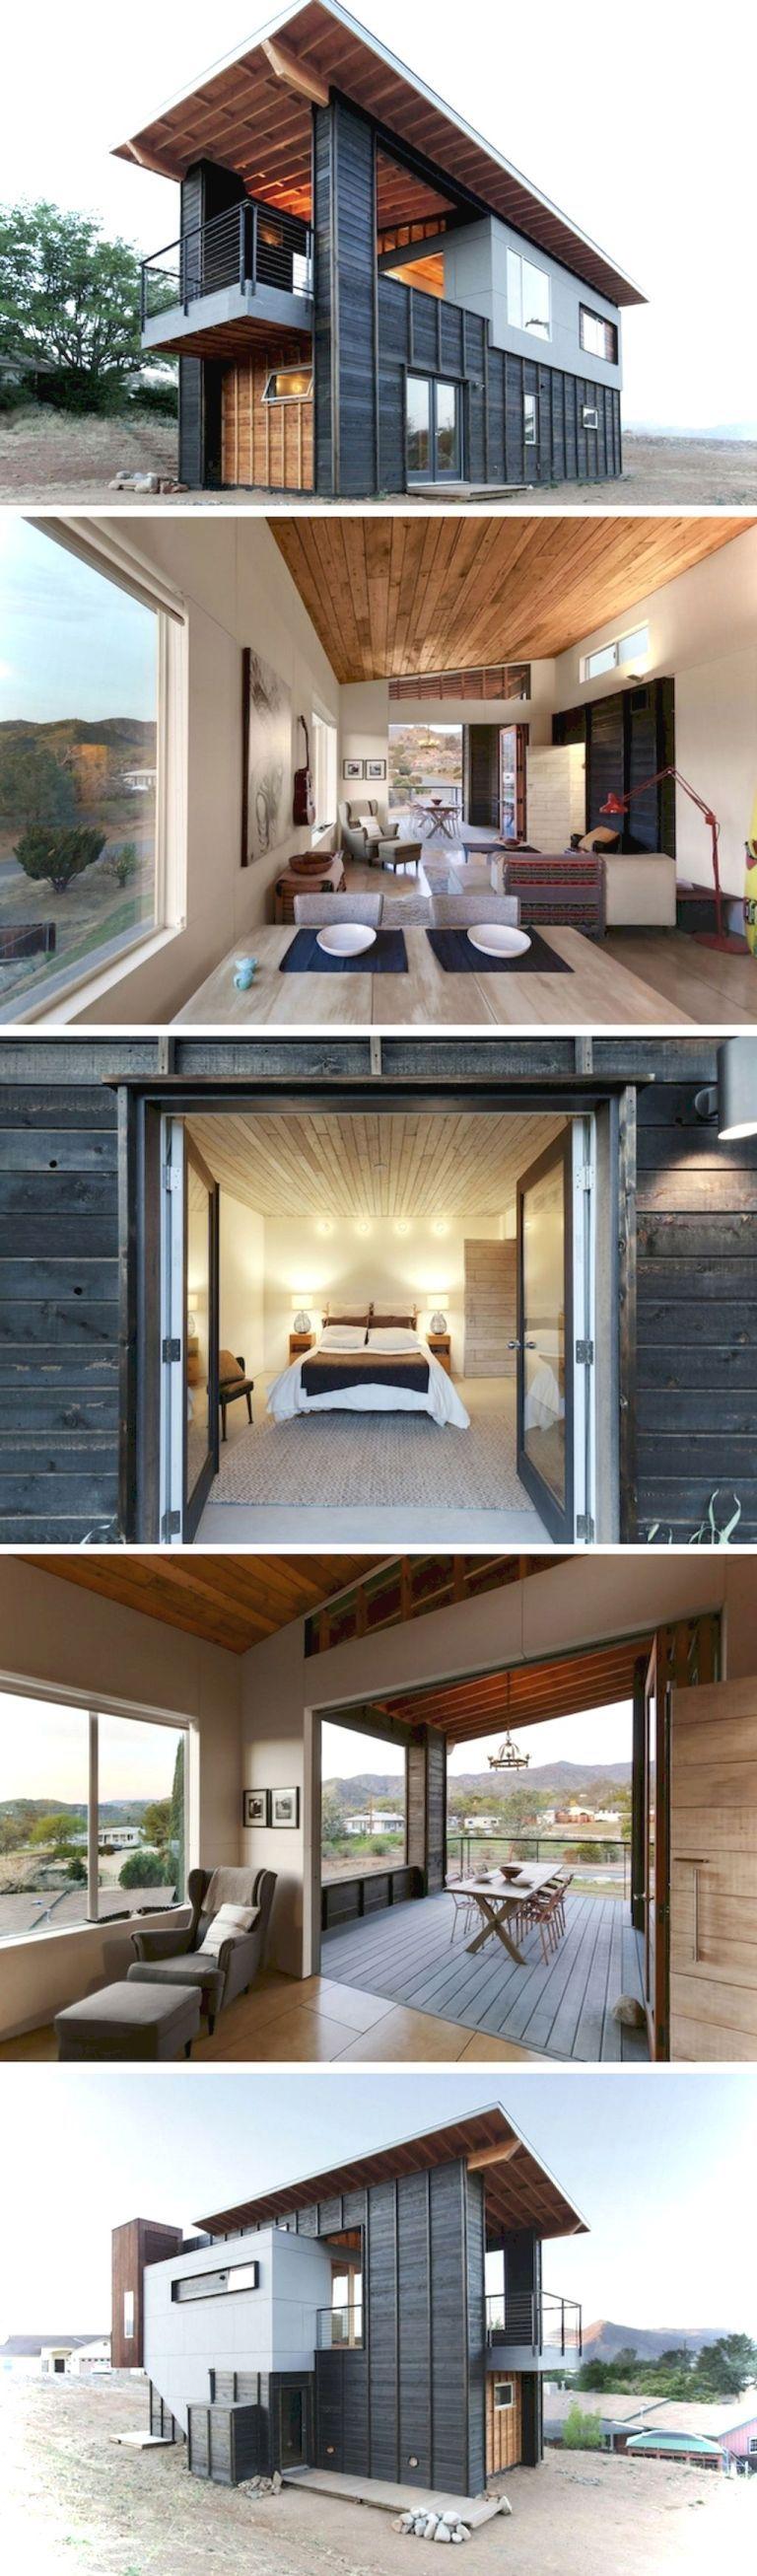 incredible tiny house interior design ideas54 casita container rh pinterest com